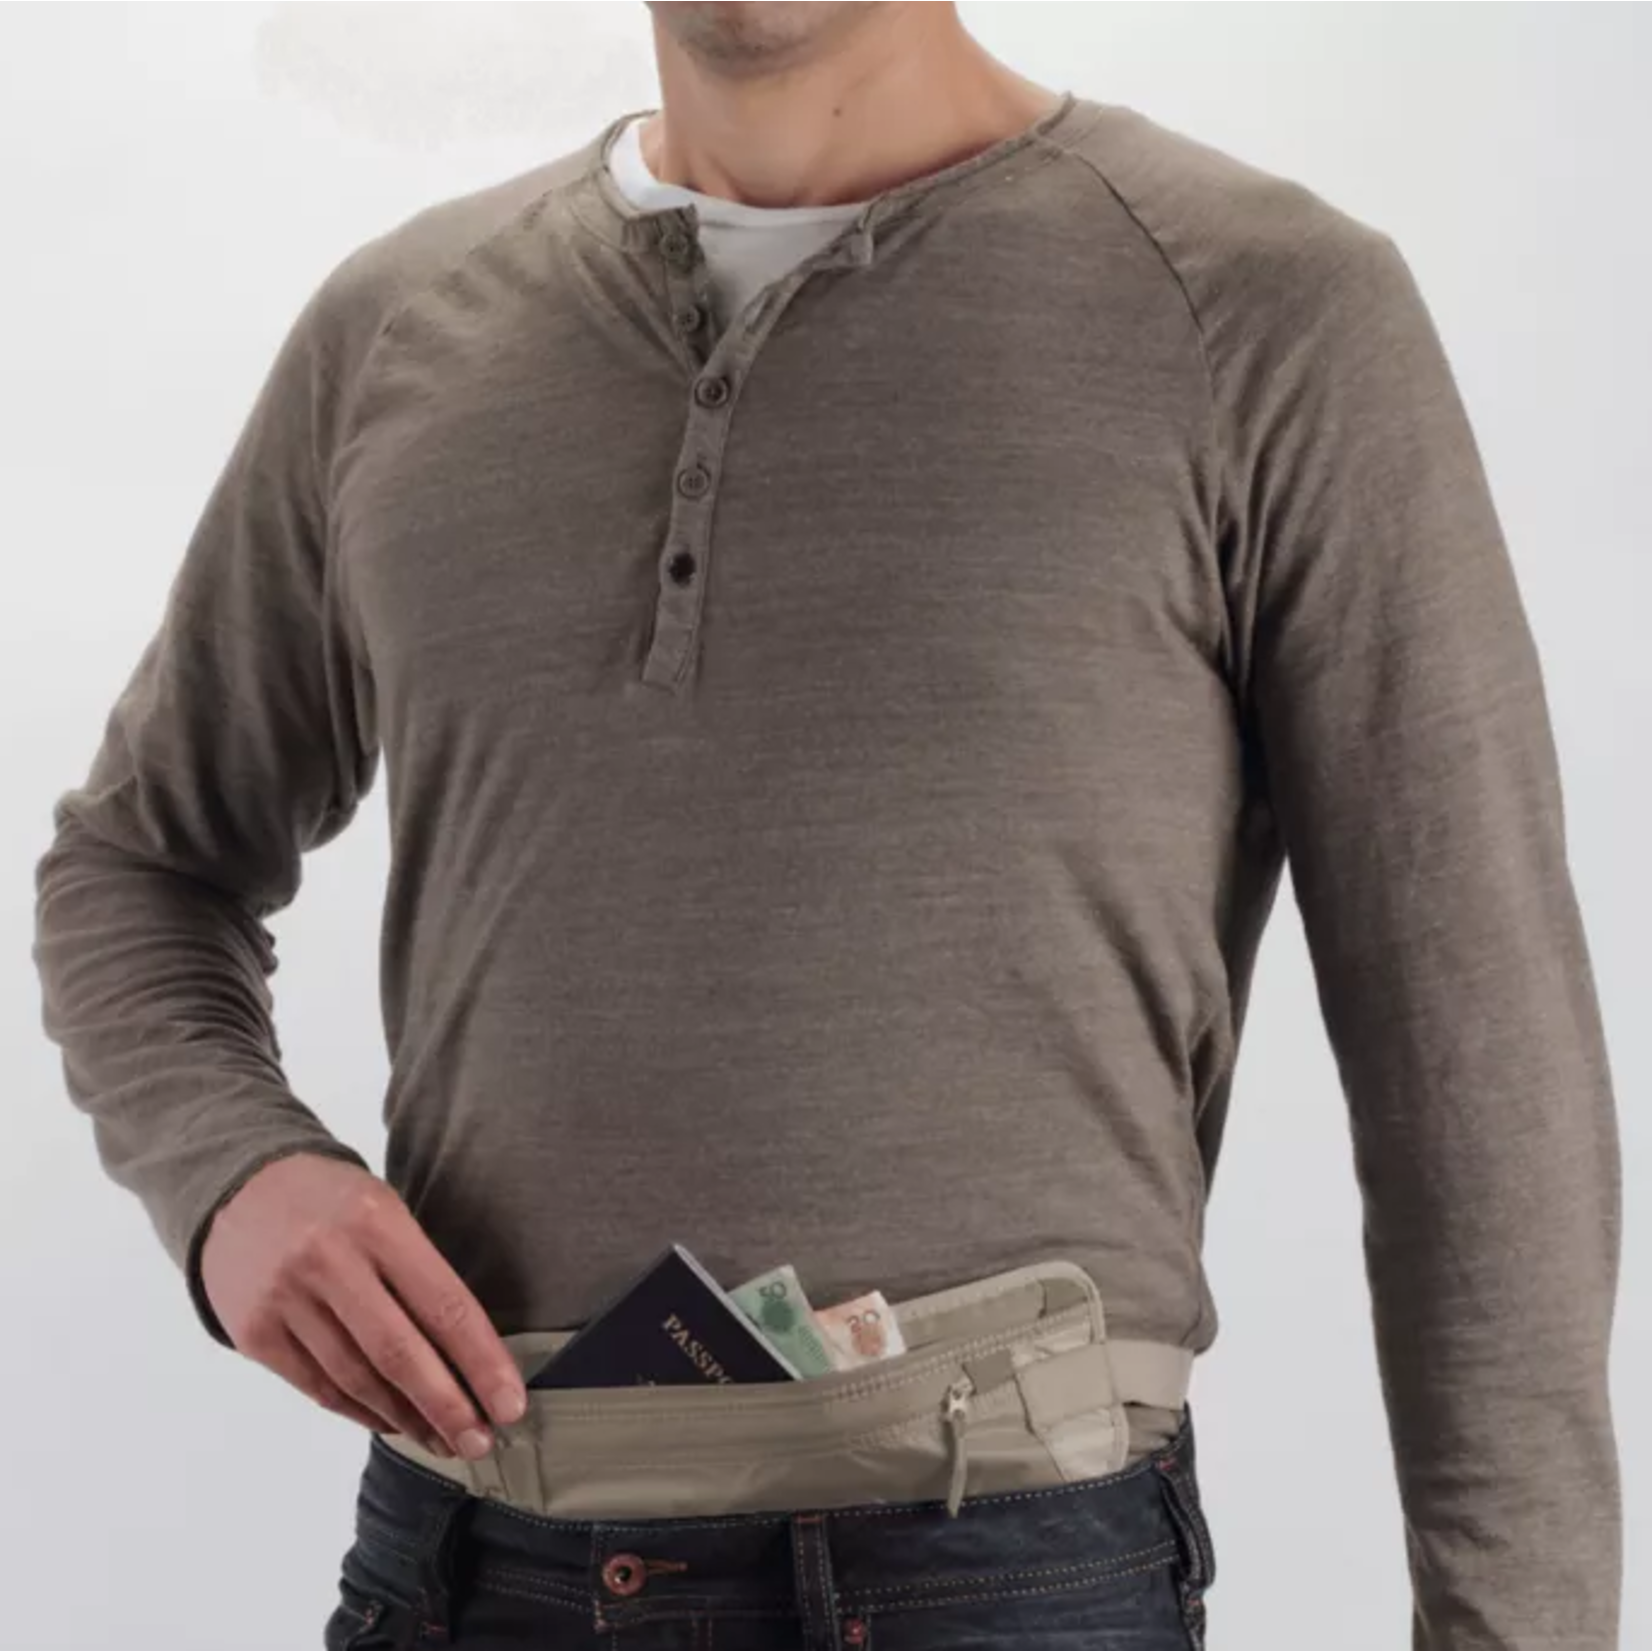 EAGLE CREEK RFID BLOCKER MONEY BELT DLX